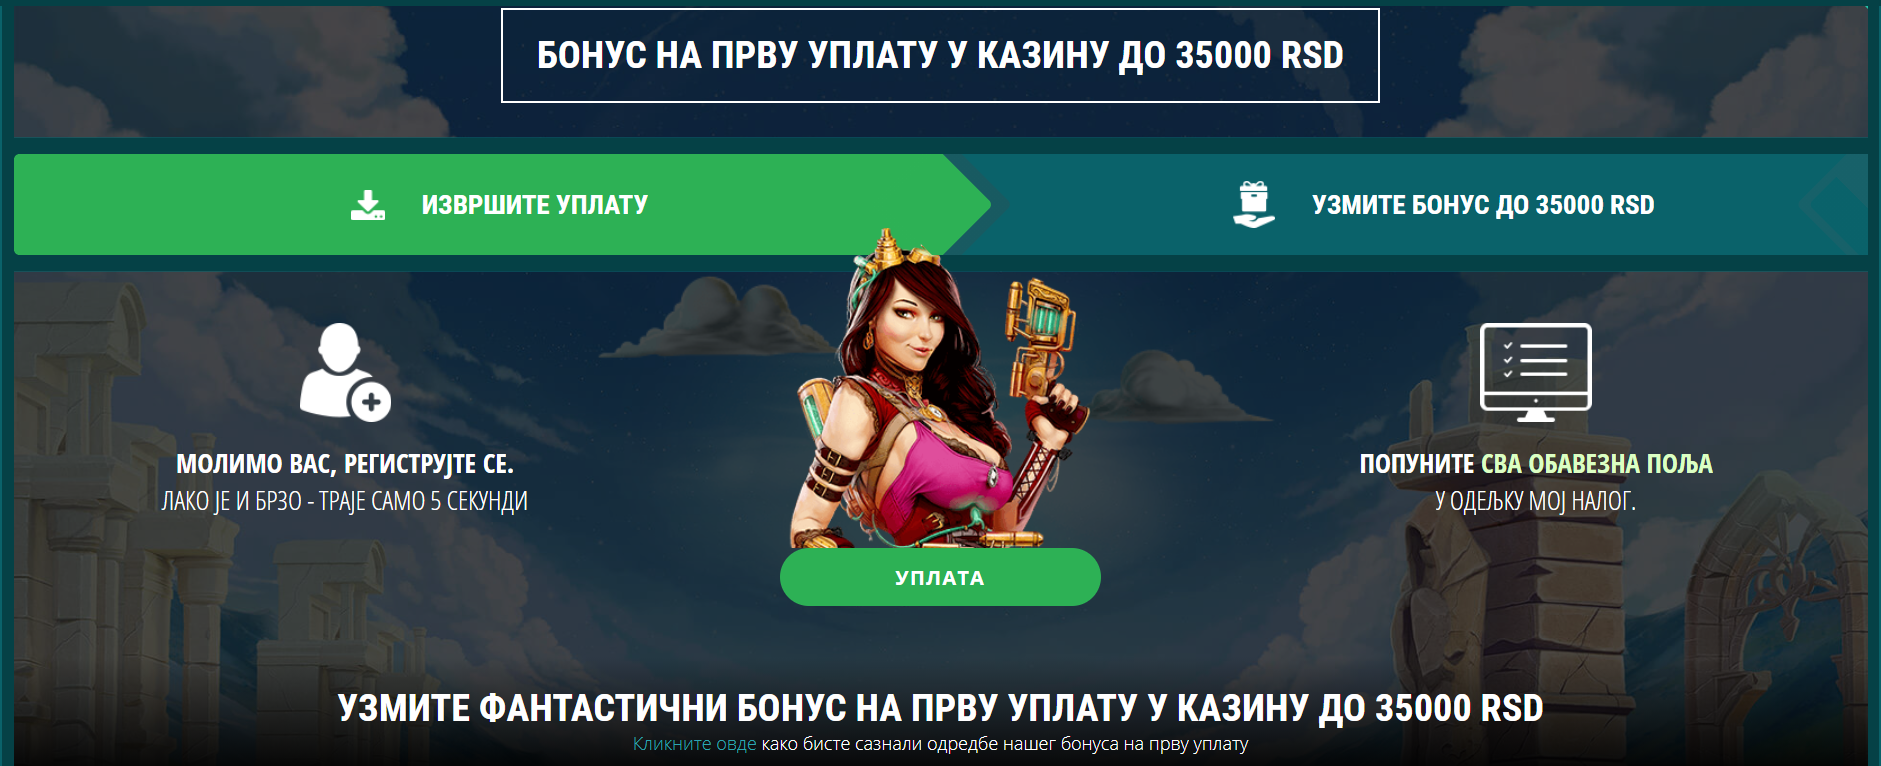 22bet bonus5